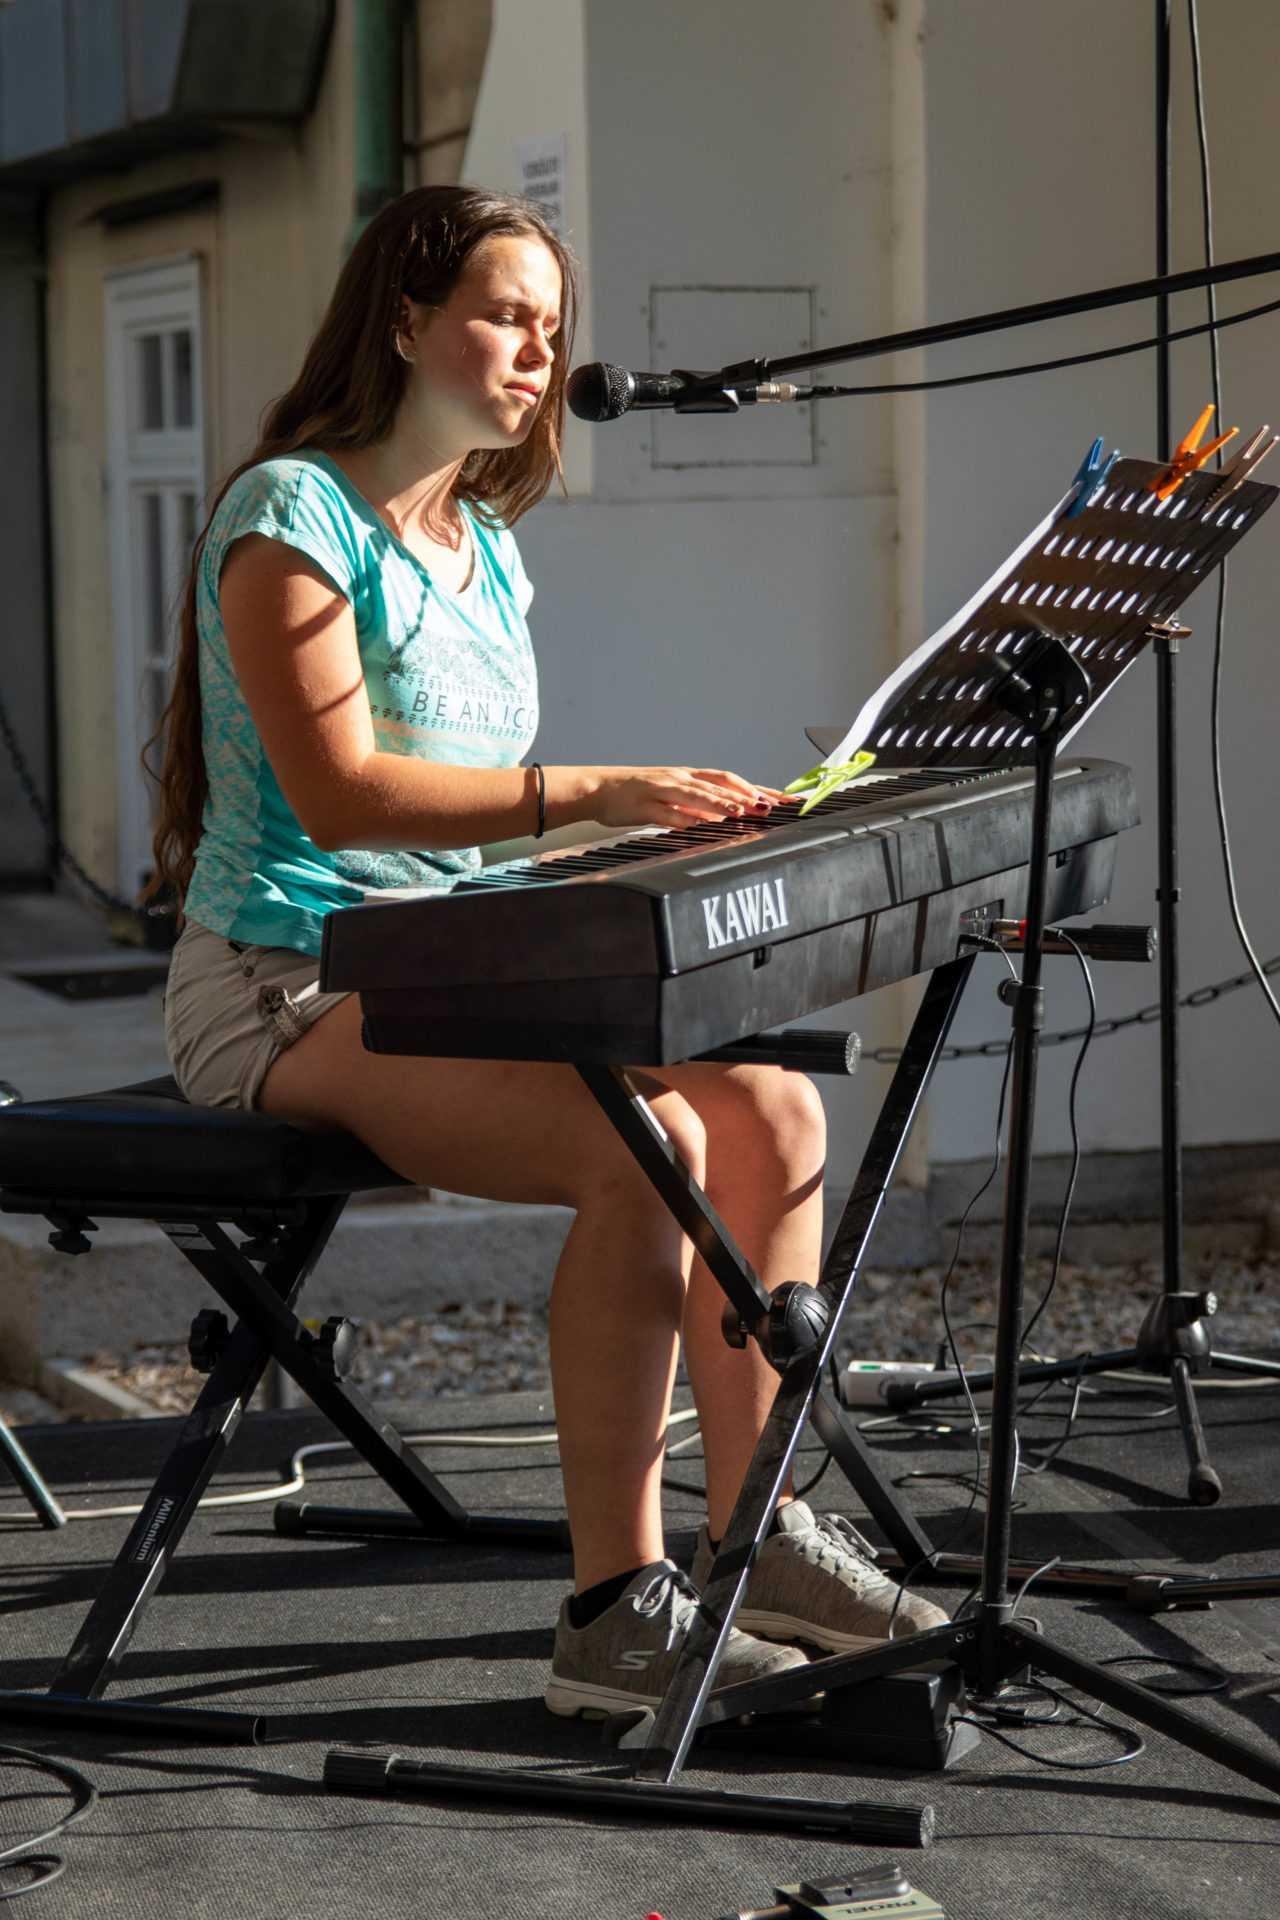 klavir kud coda